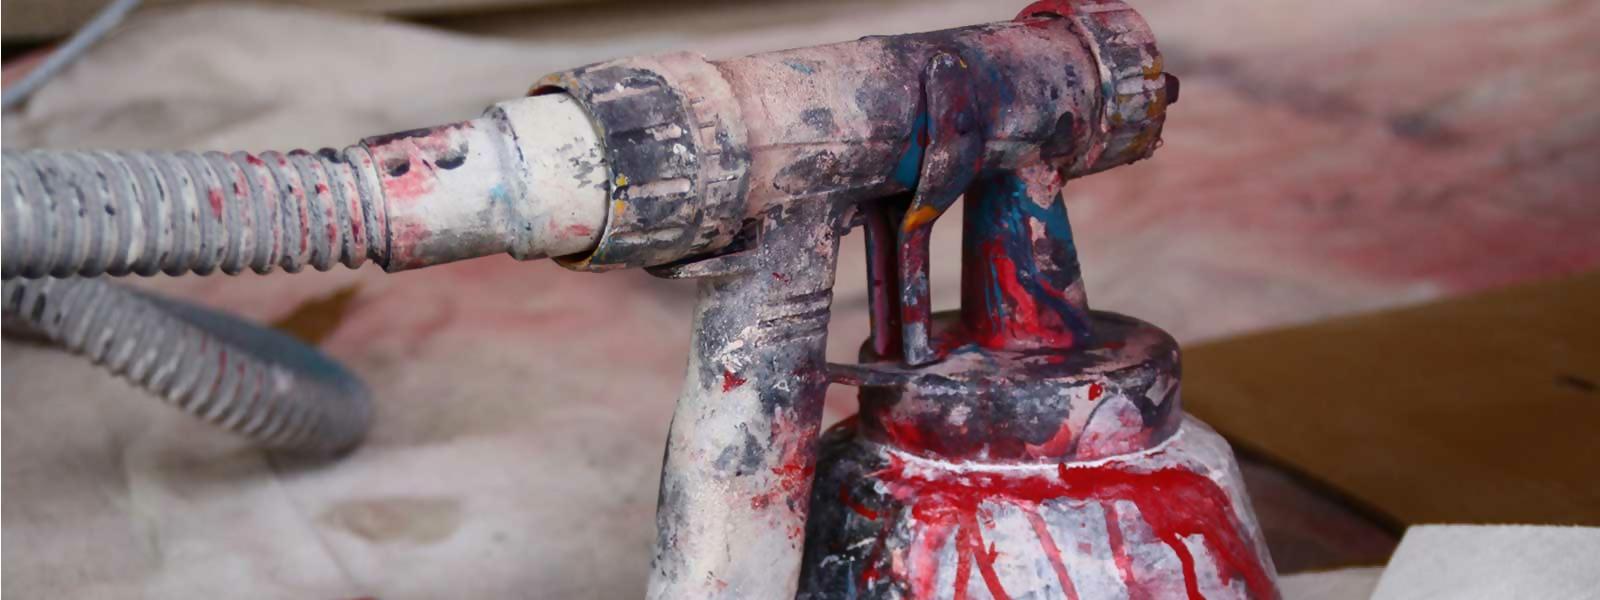 Резултат слика за paint sprayer dirty